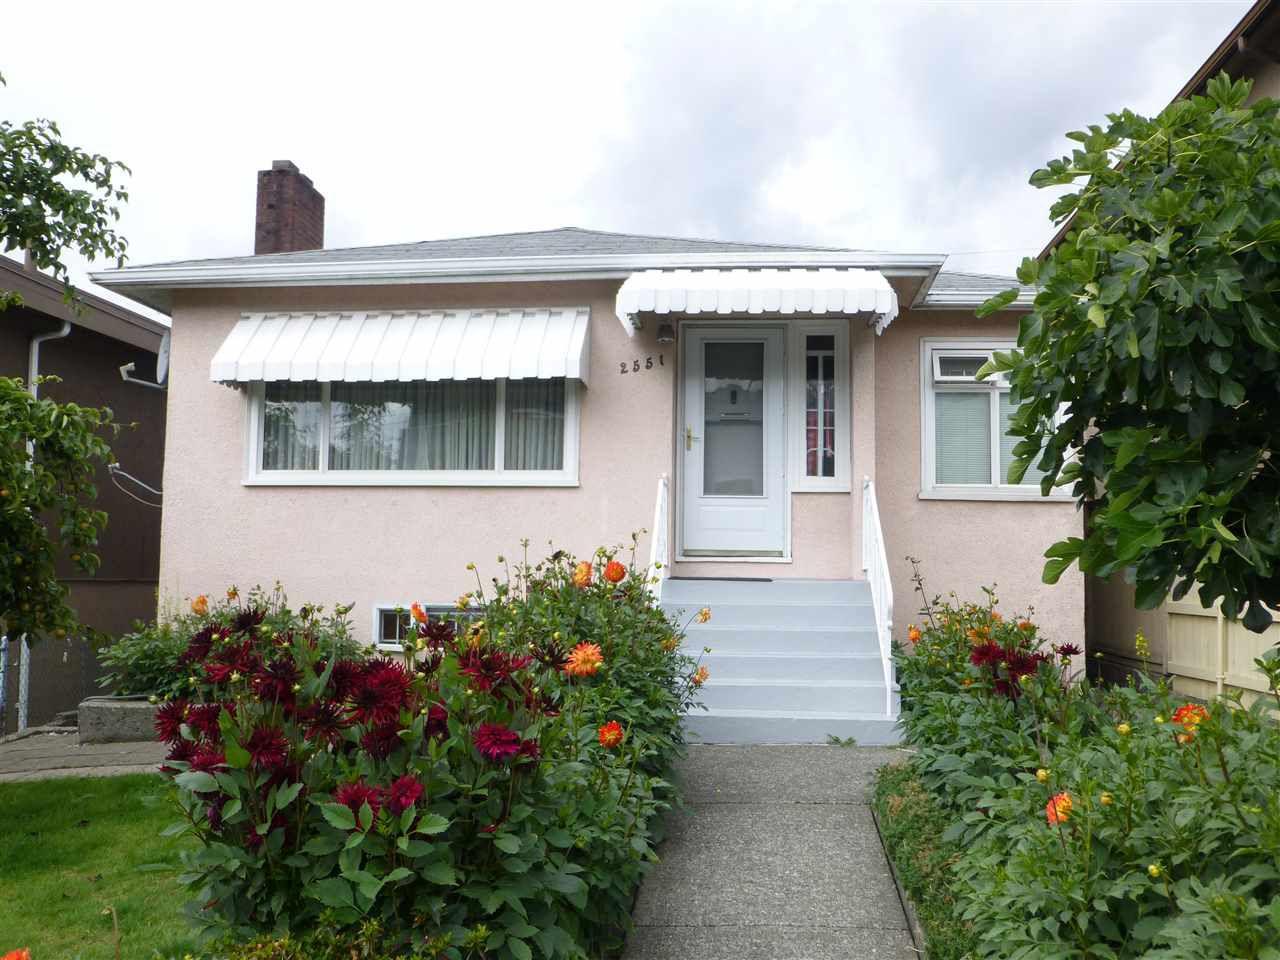 Main Photo: 2551 RENFREW Street in Vancouver: Renfrew VE House for sale (Vancouver East)  : MLS®# R2092376